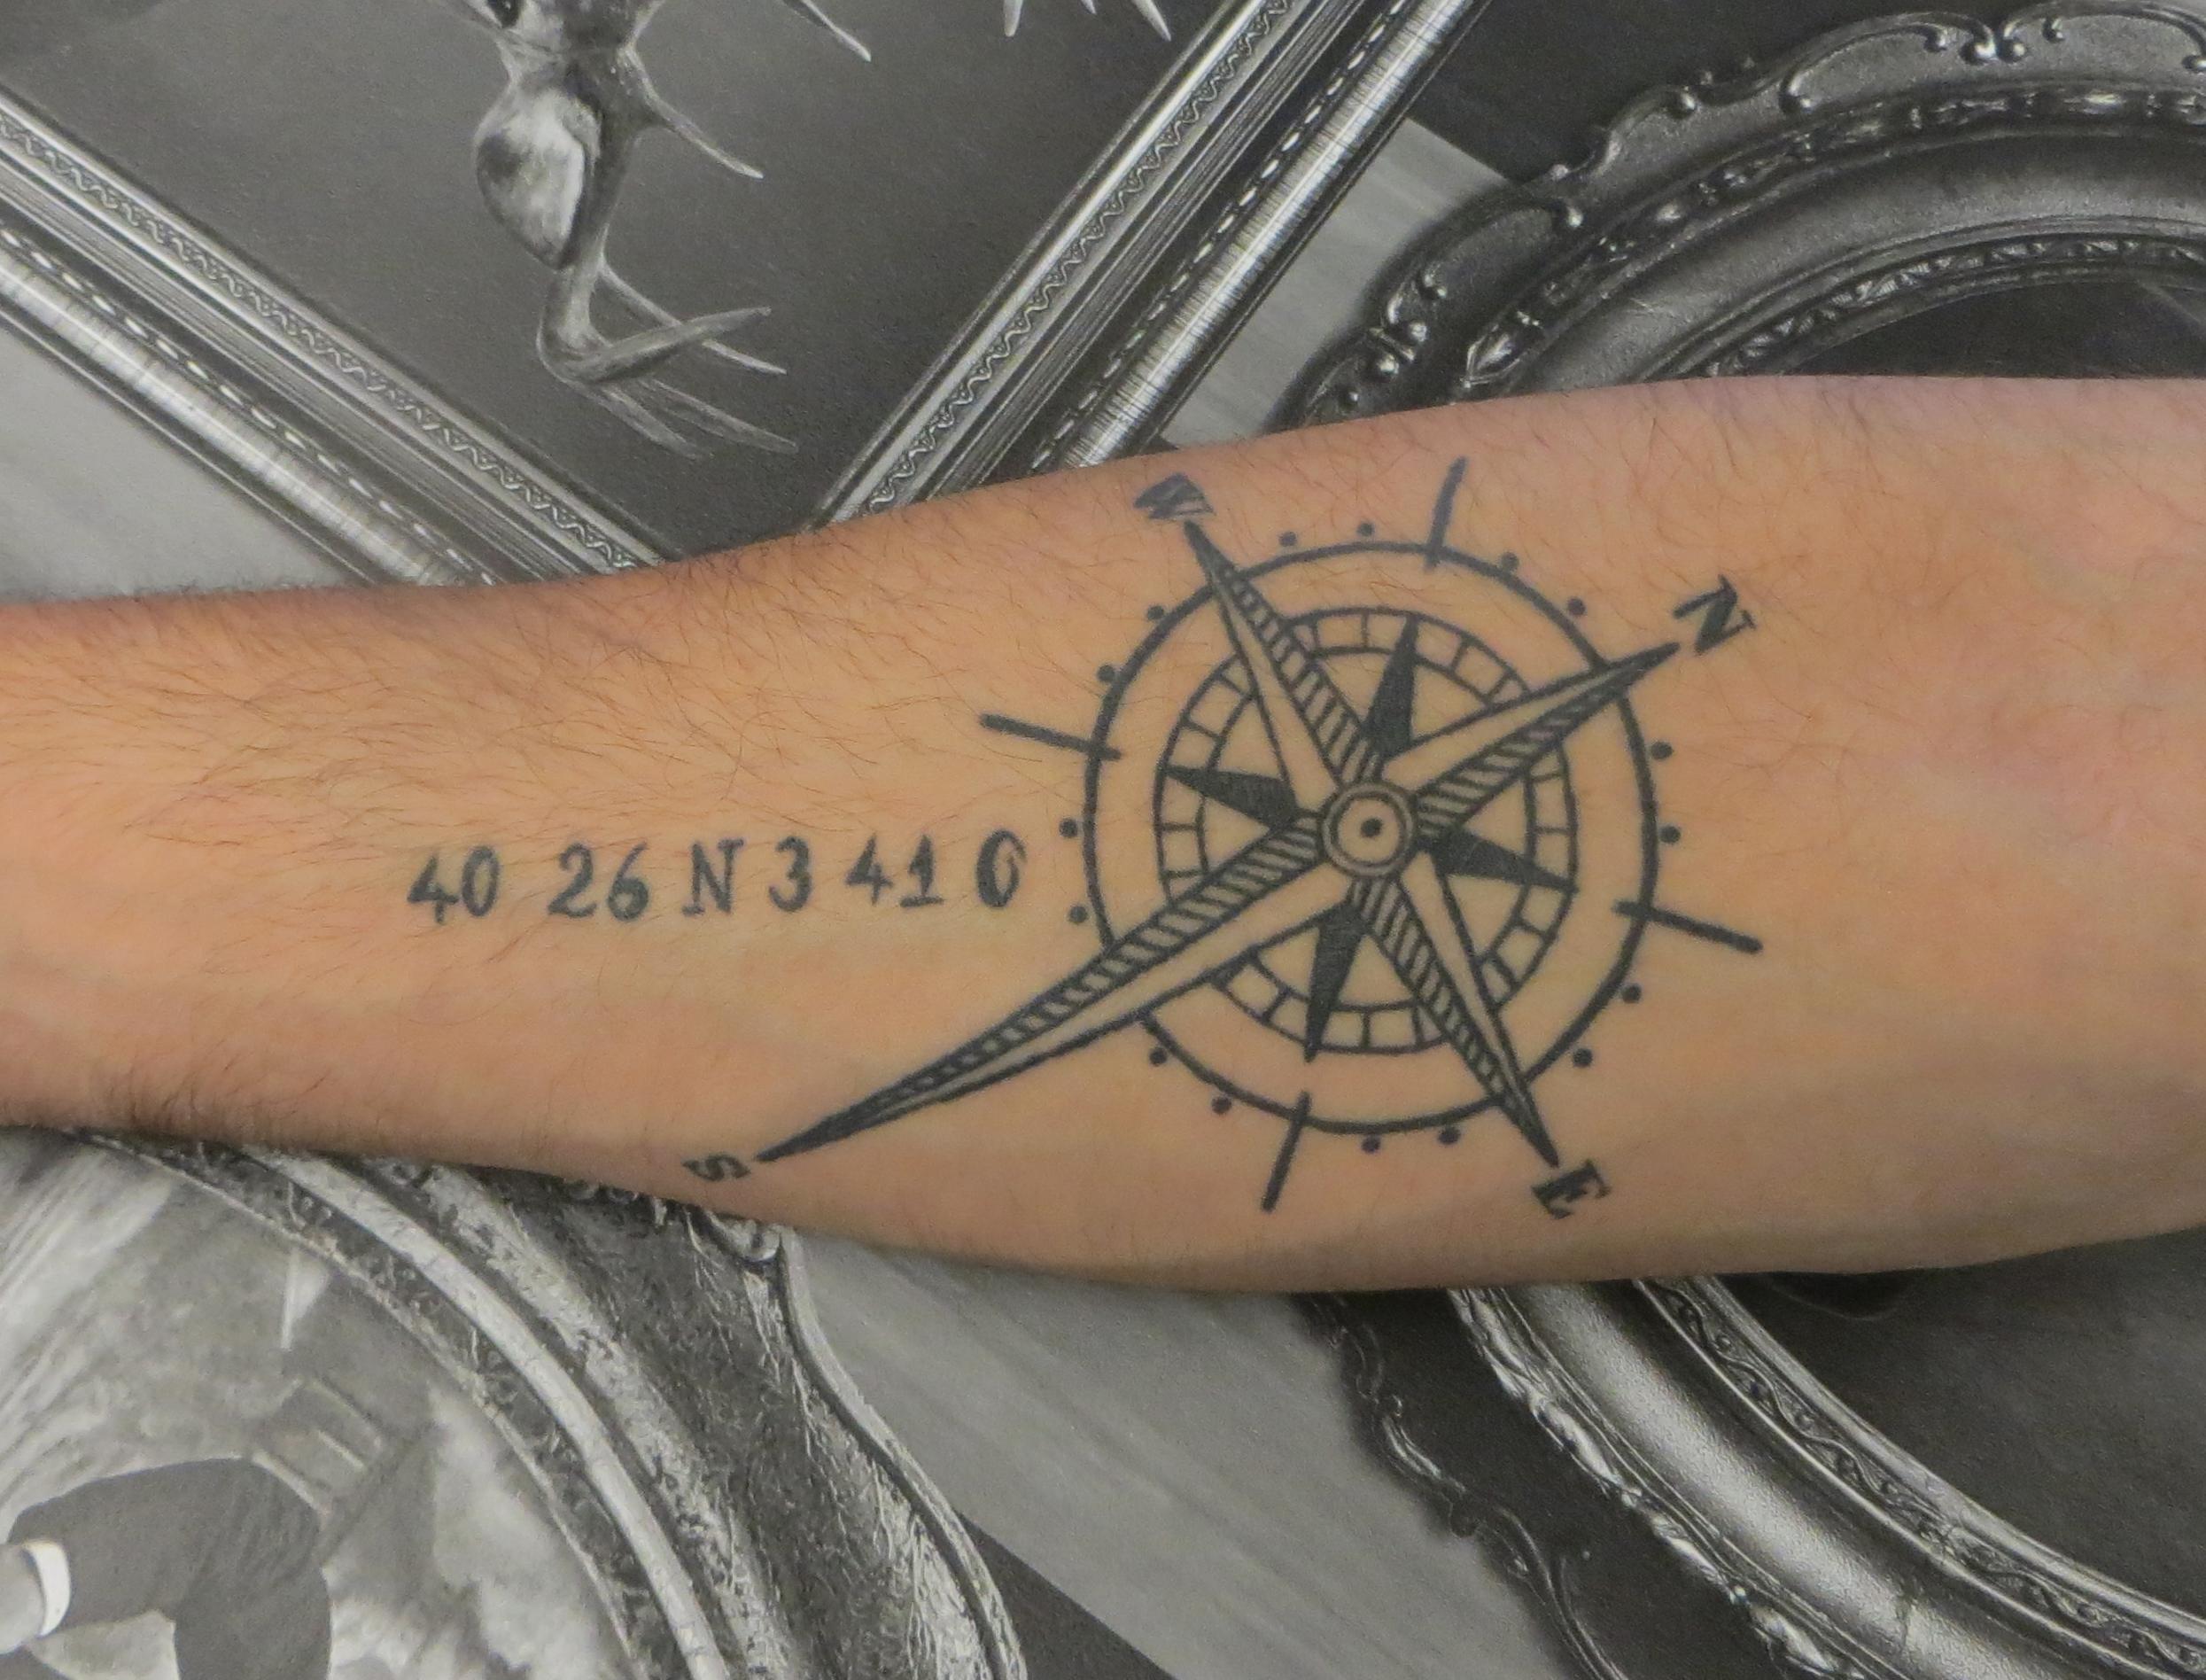 tatouage phrase avec etoile